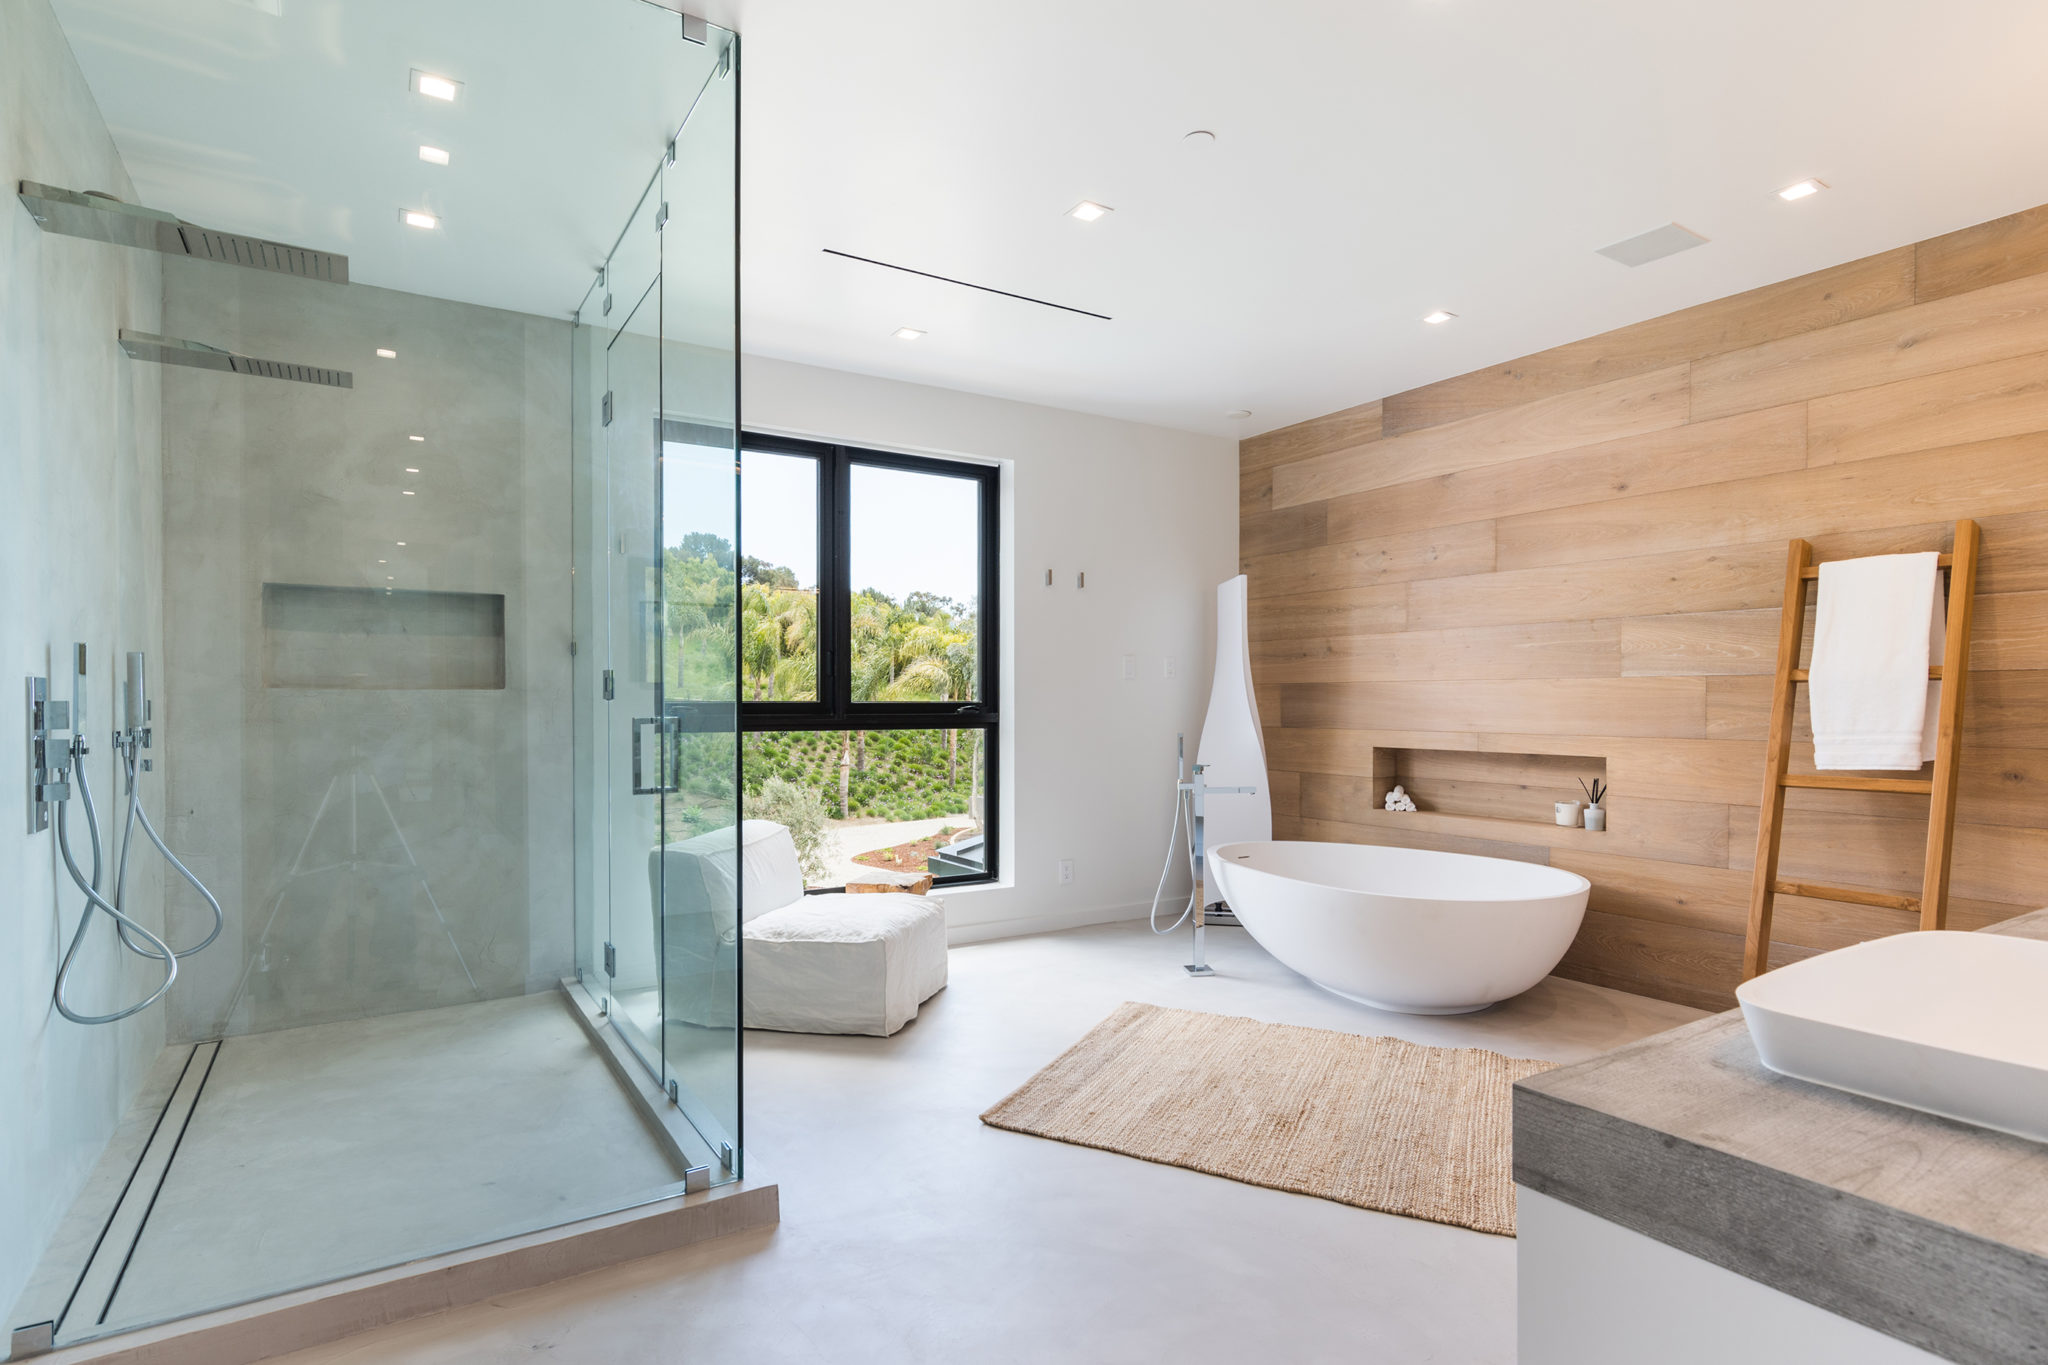 Bathroom furniture,bathroom cabinets - GPF 7223 Edit